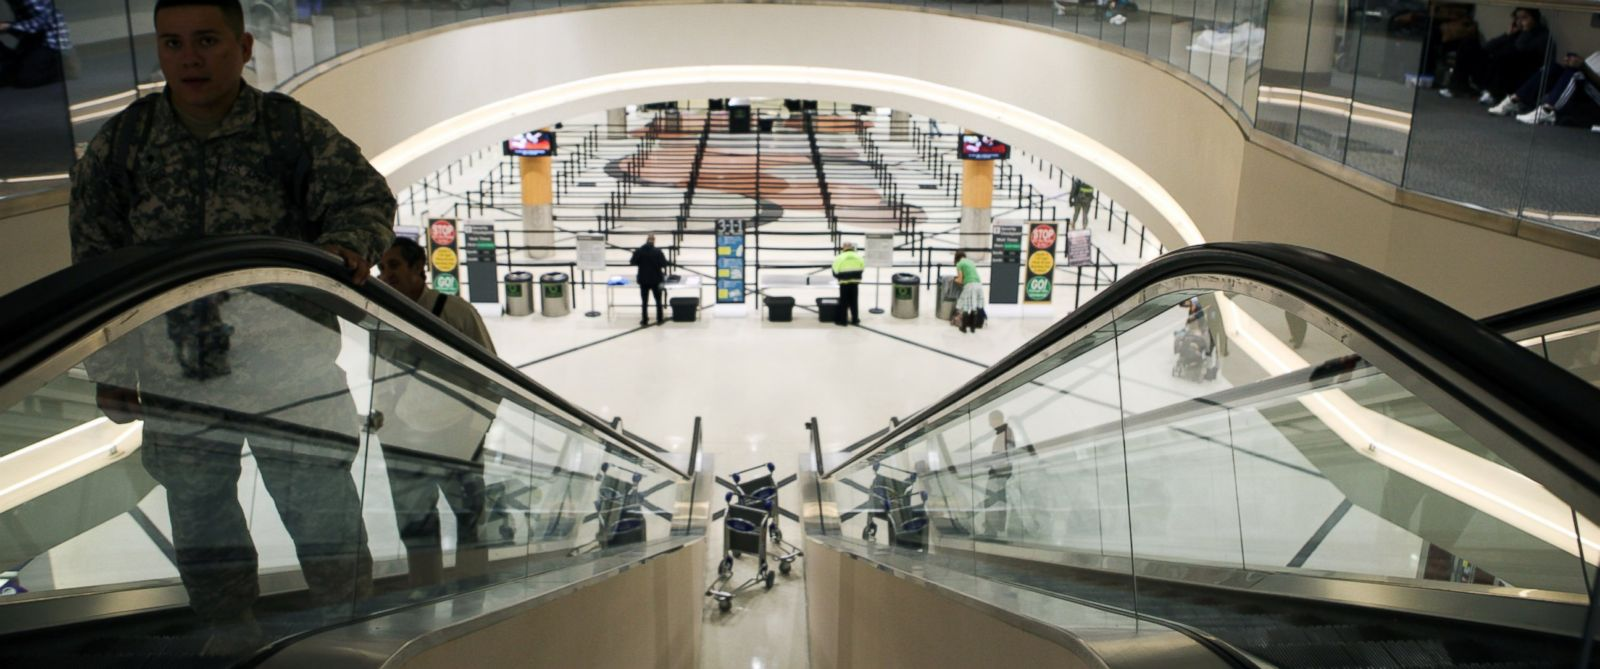 PHOTO: The security lines at Hartsfield-Jackson International Airport in Atlanta, Jan. 10, 2011.